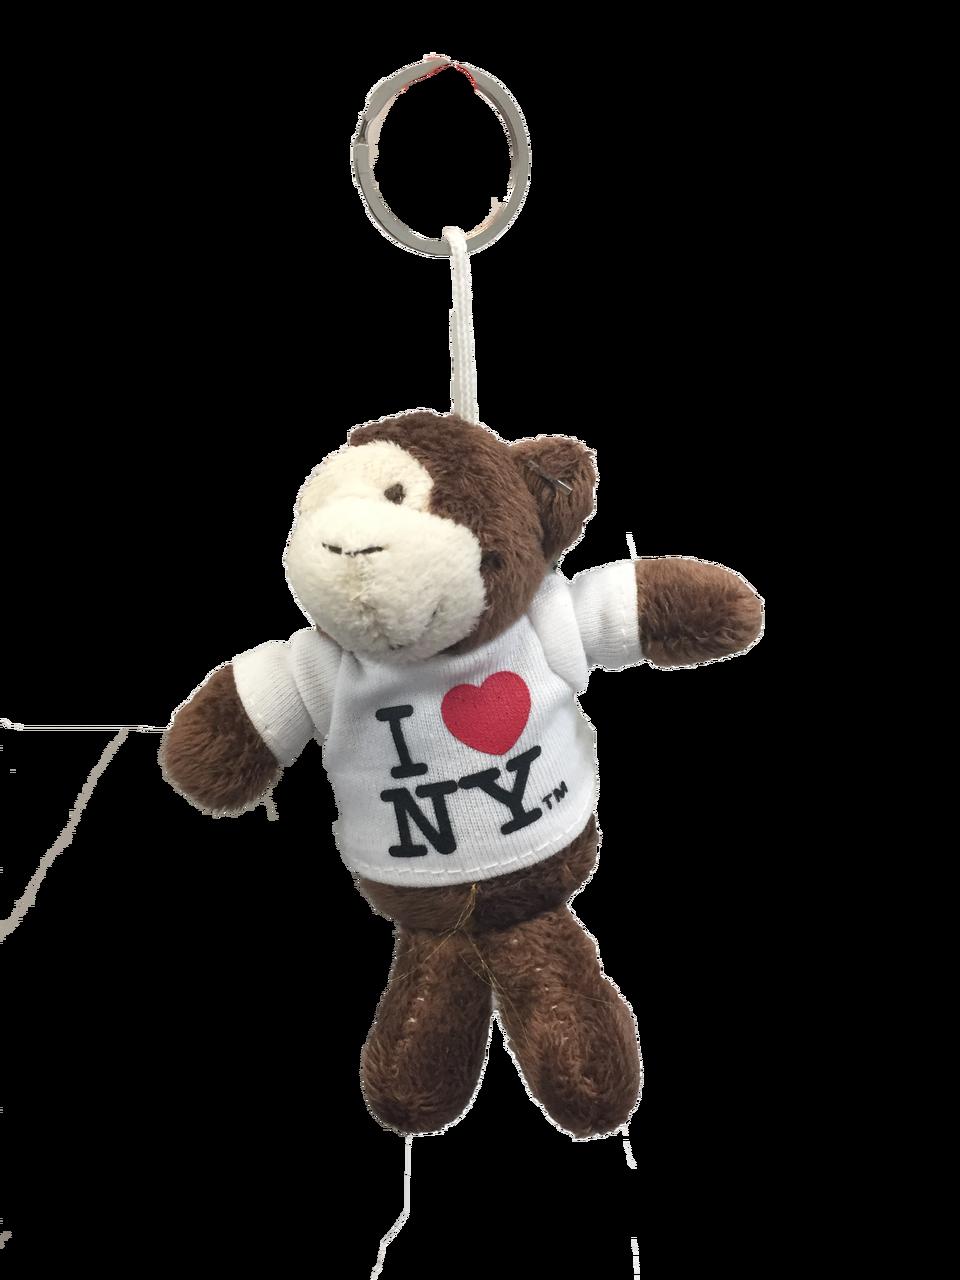 I Love NY Monkey Plush Key Chain 4b81a431981f